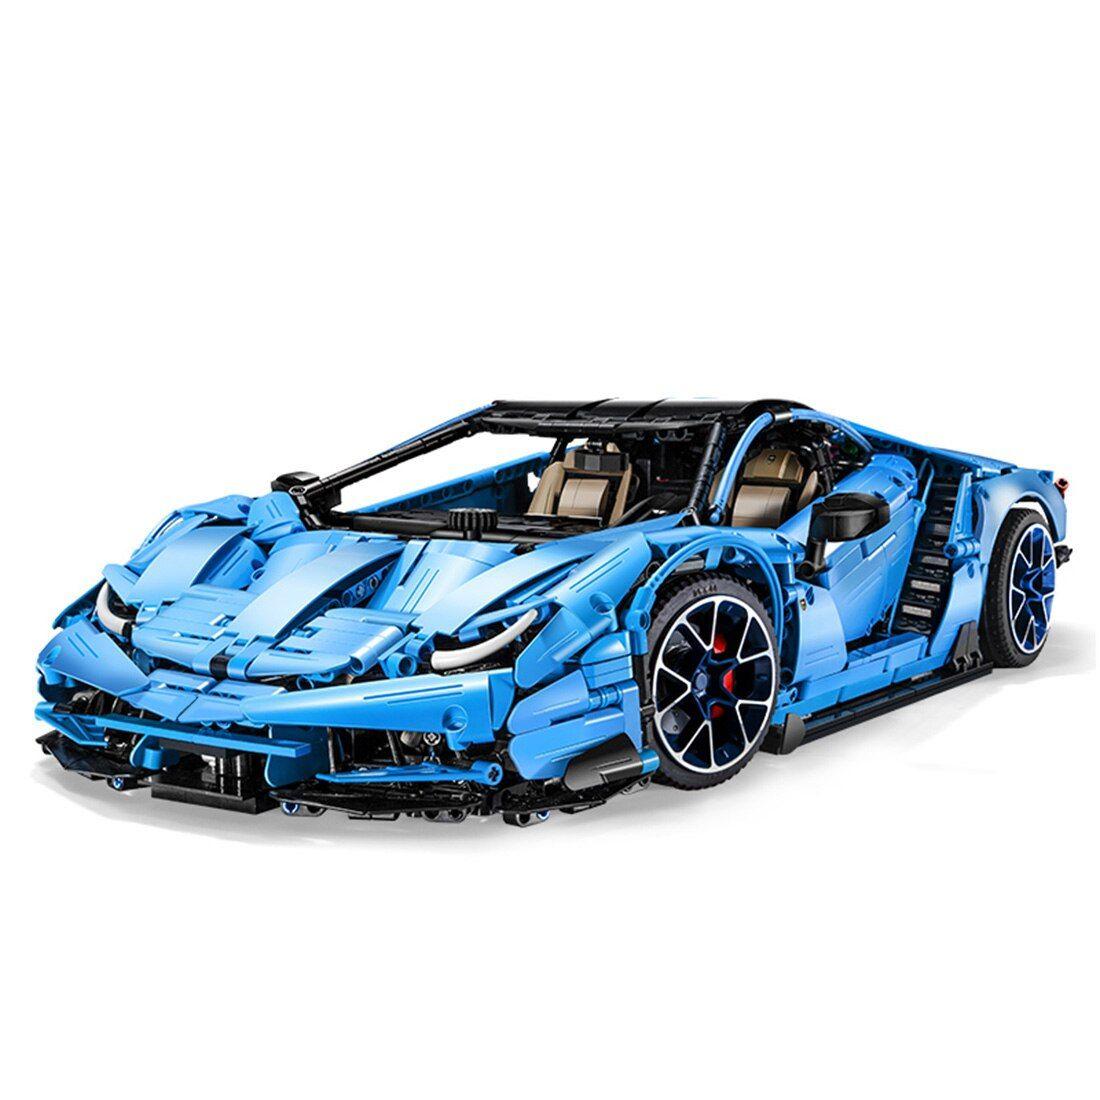 Cada Master C61041: Lamborghini Centenario Klemmbausteine (3842 Teile, Maßstab 1:8, V12 Replikmotor, 7-Gang-Schaltgetriebe)